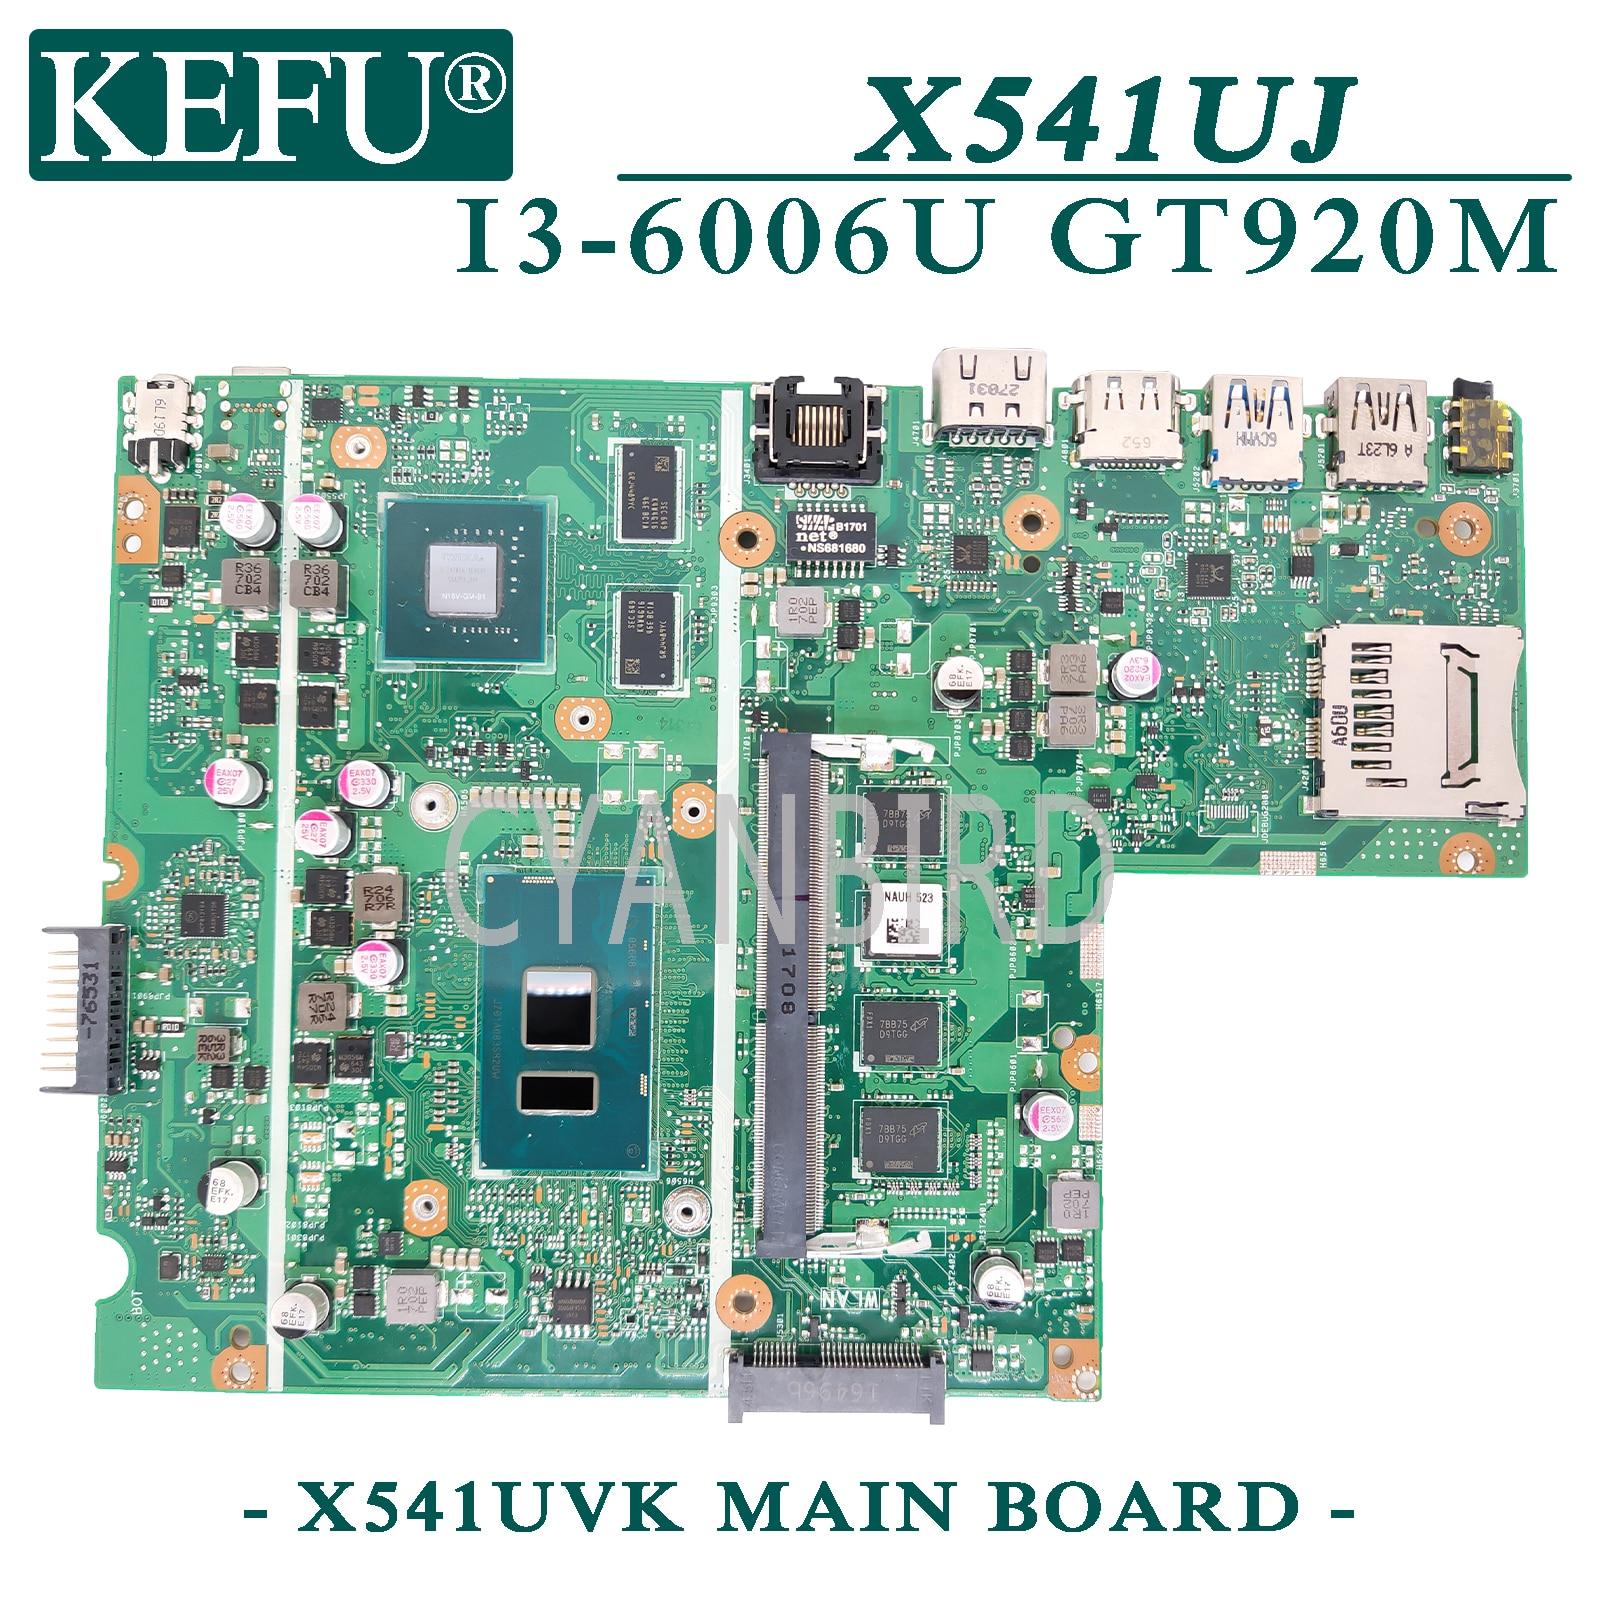 KEFU X541UVK اللوحة الأصلية ل ASUS X541UJ X541UV X541U مع 4GB-RAM I3-6006U GT920M اللوحة المحمول